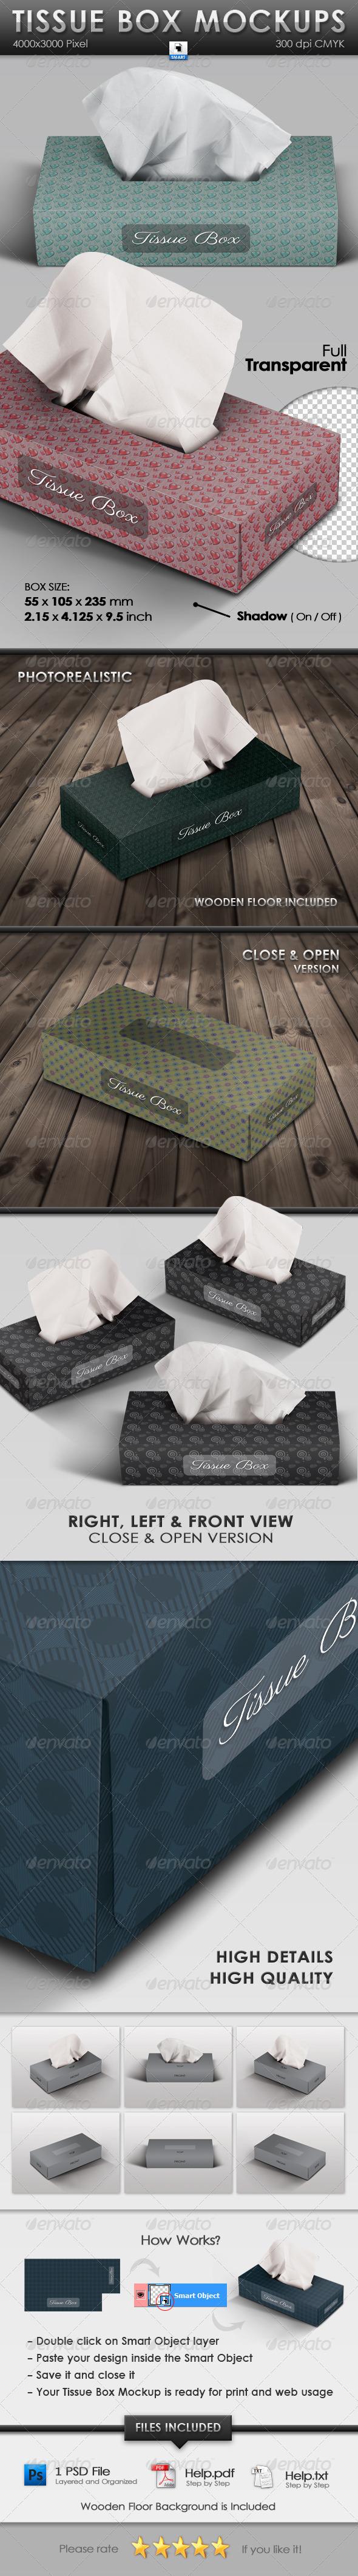 Tissue Box Mockups